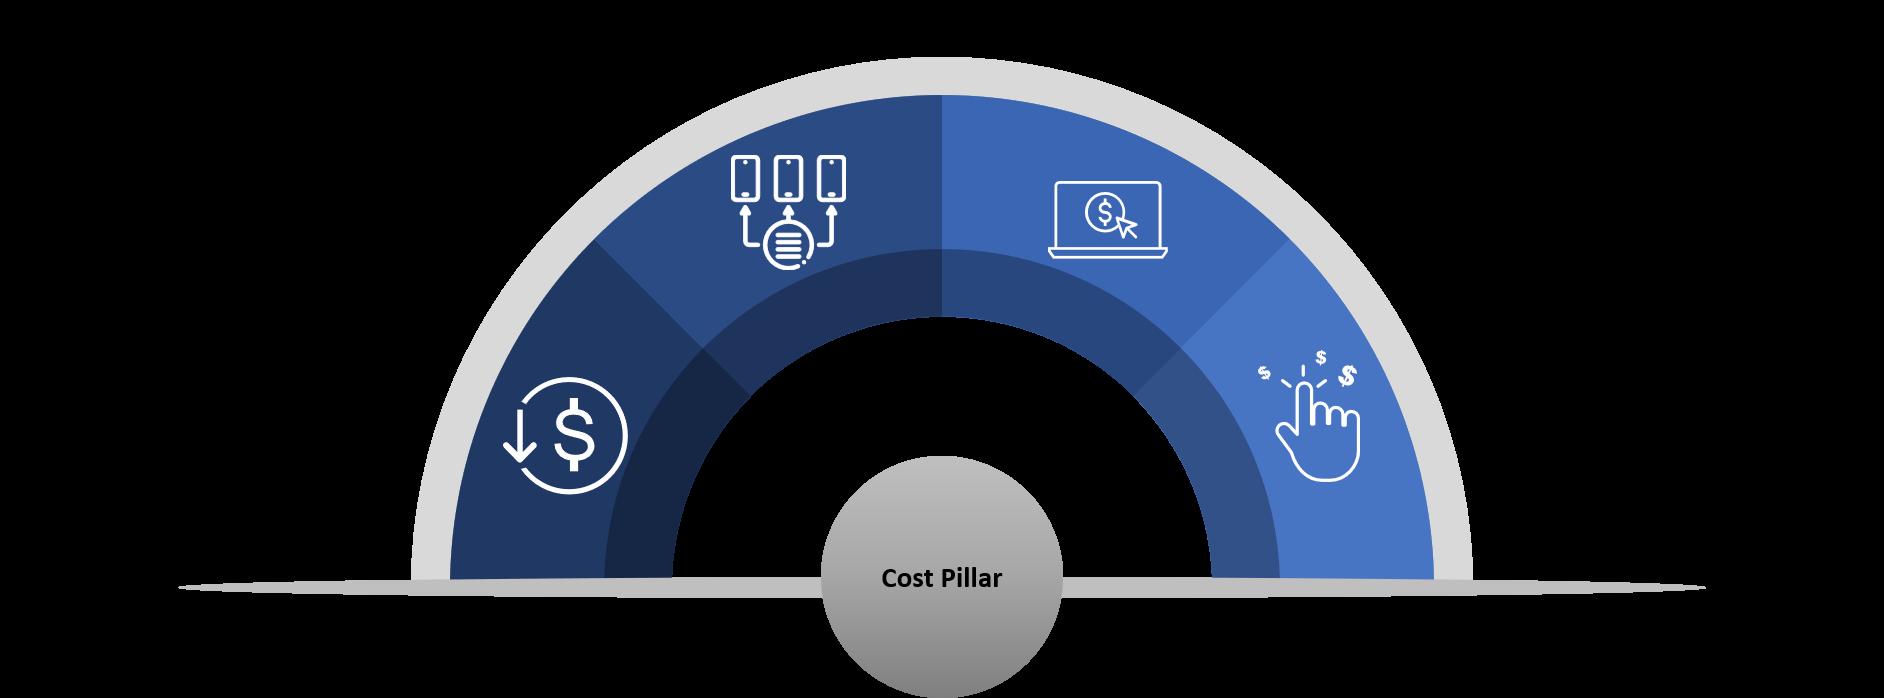 Cost Pillar